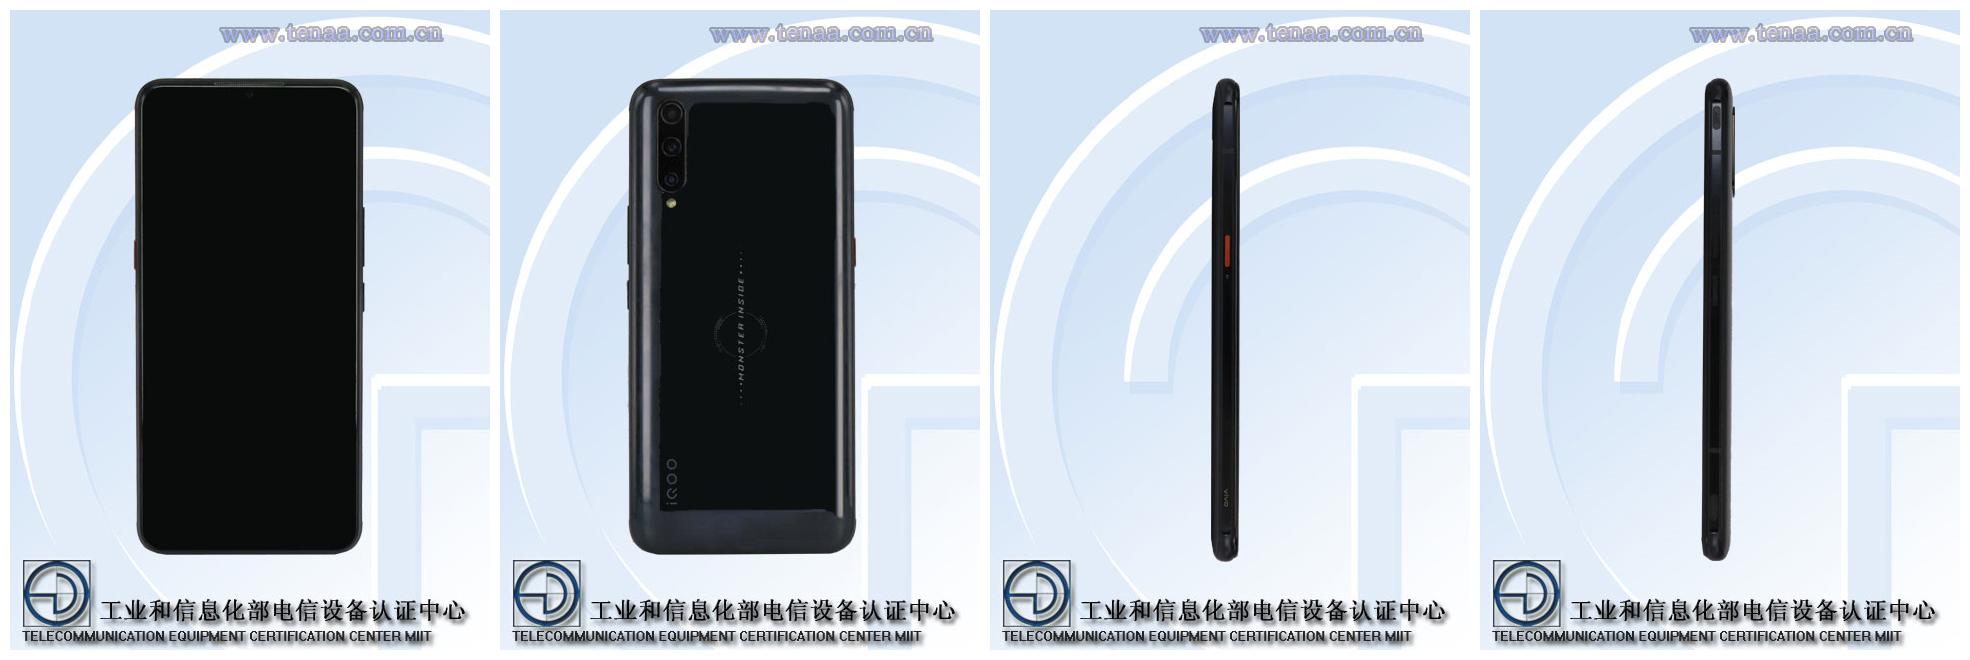 iQOO Pro外形公布:水滴屏+后置三摄